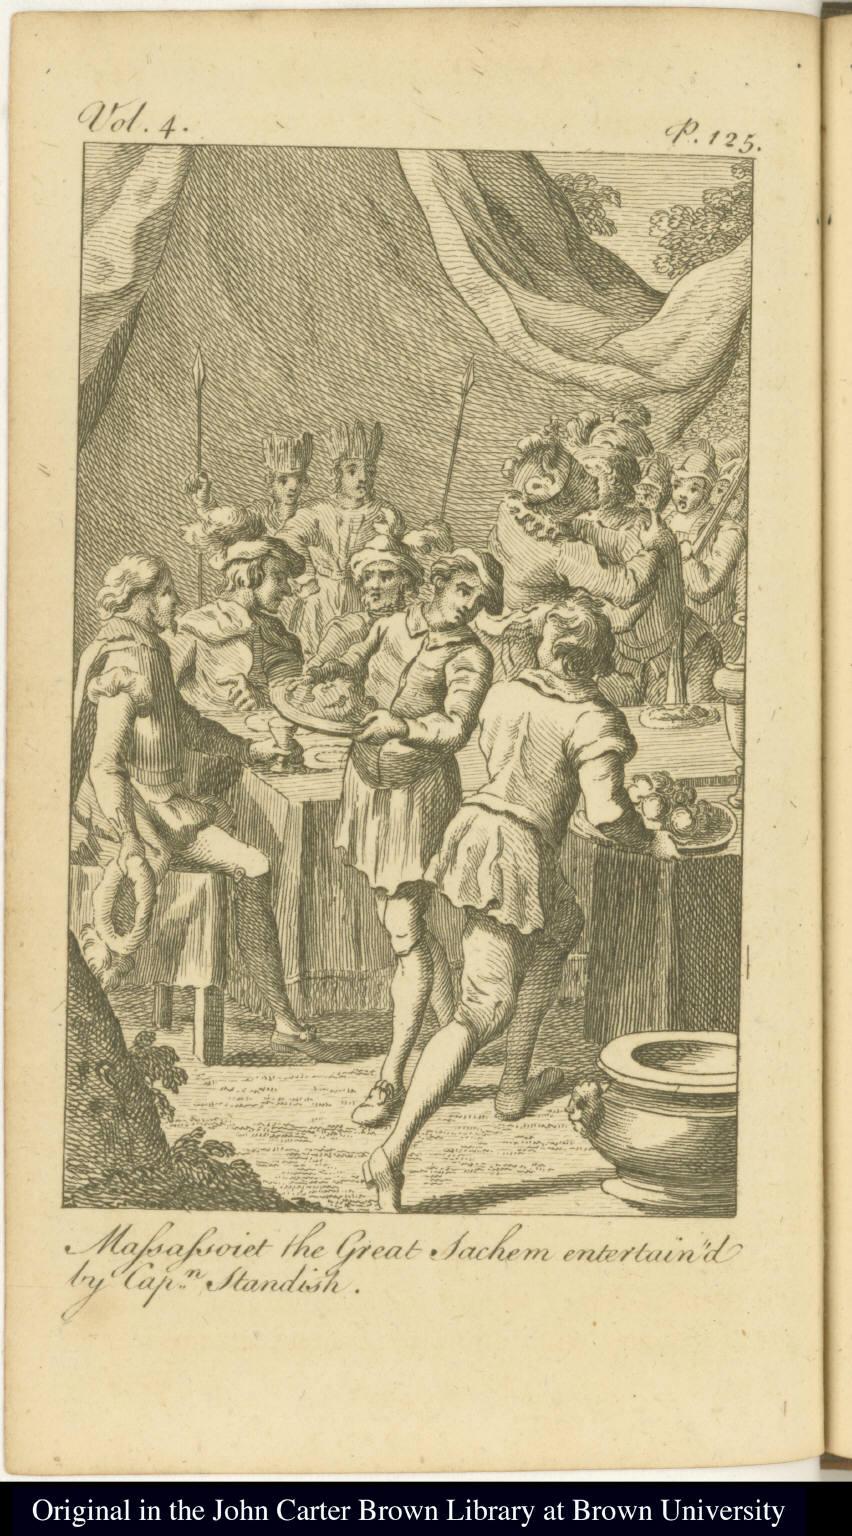 Massassoiet the Great Sachem entertain'd by Capn. Standish.